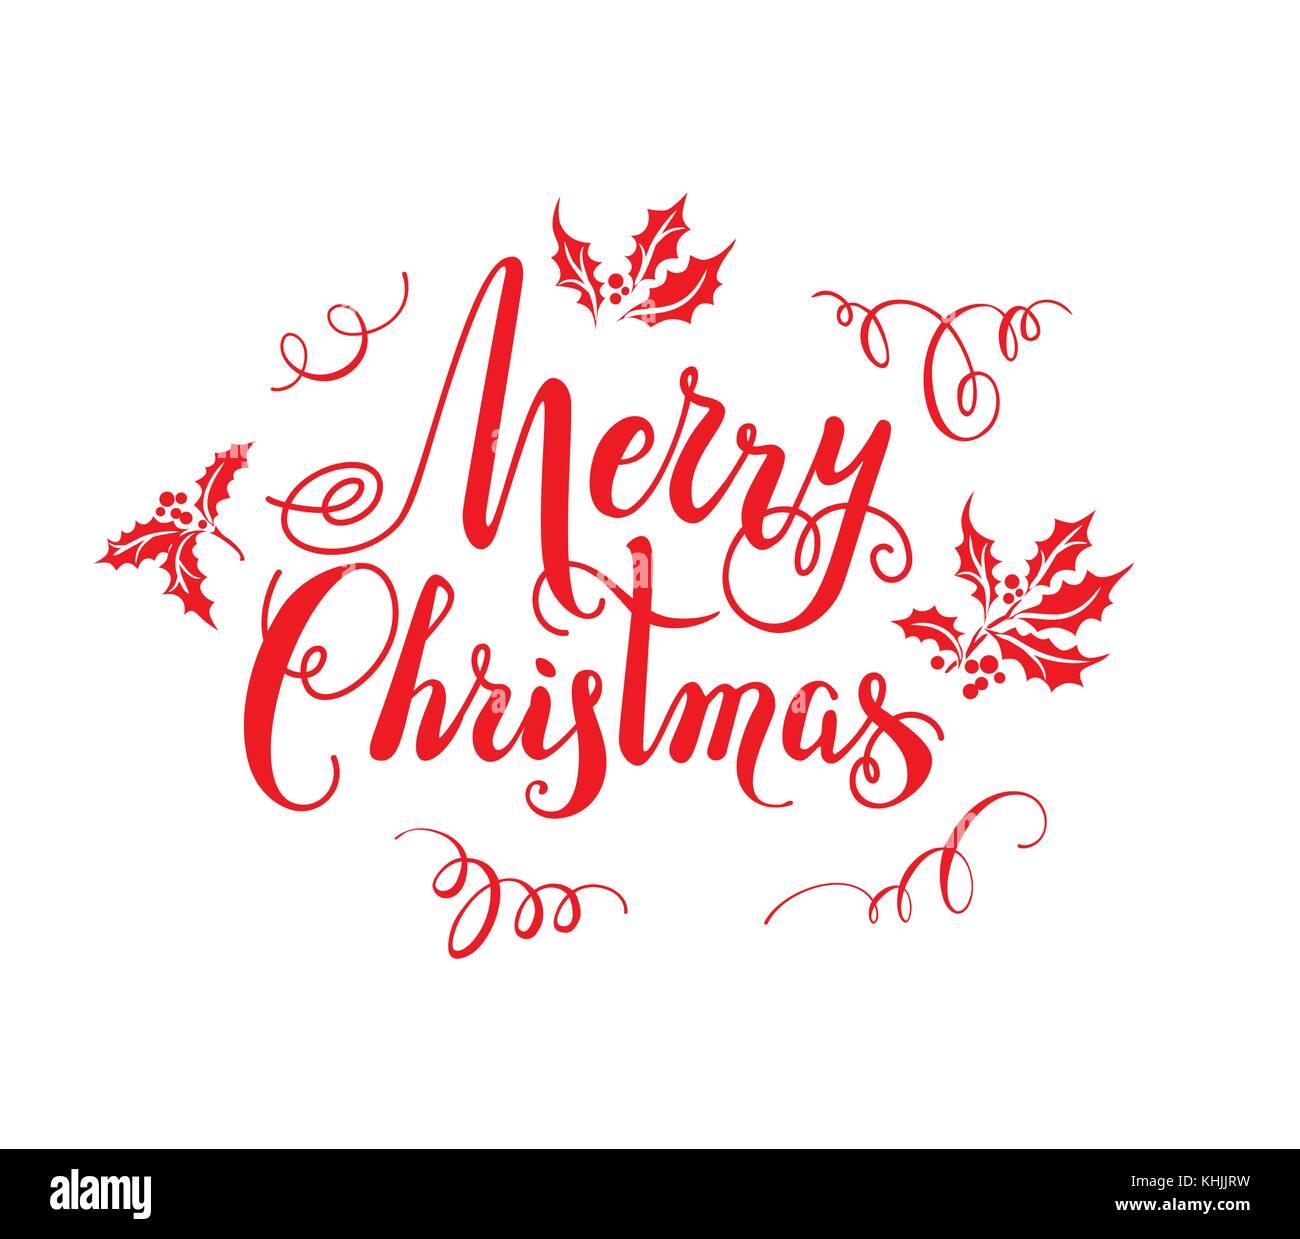 rot frohe weihnachten schriftzug vektor abbildung bild 165752381 alamy. Black Bedroom Furniture Sets. Home Design Ideas